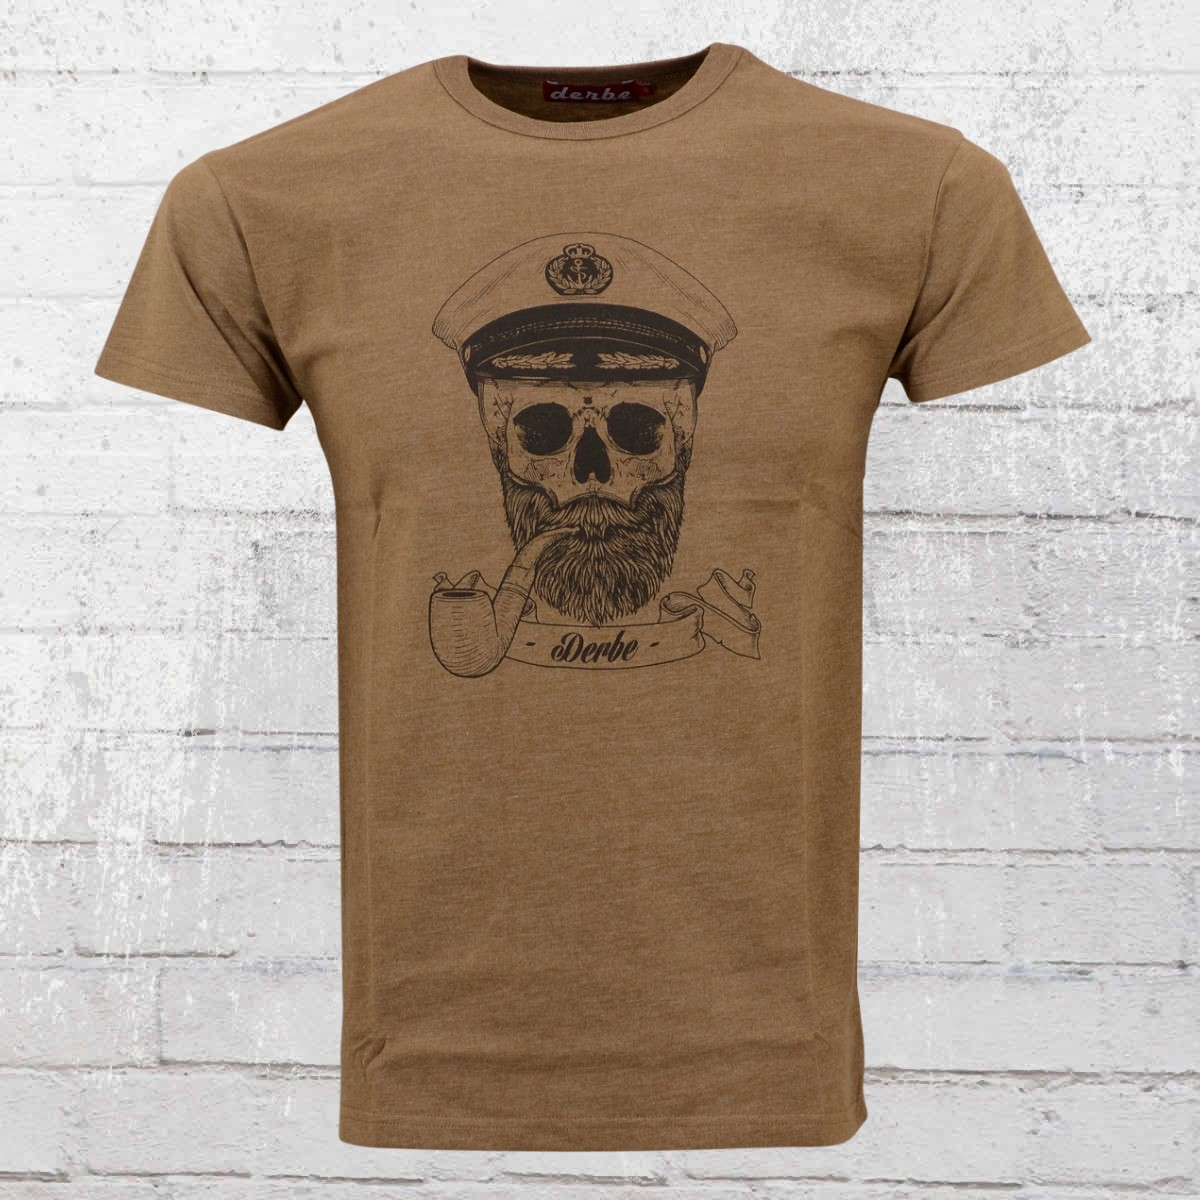 Braun Shirt Jetzt BestellenDerbe Hamburg T Spooky Männer Captain wTPXZiuOlk